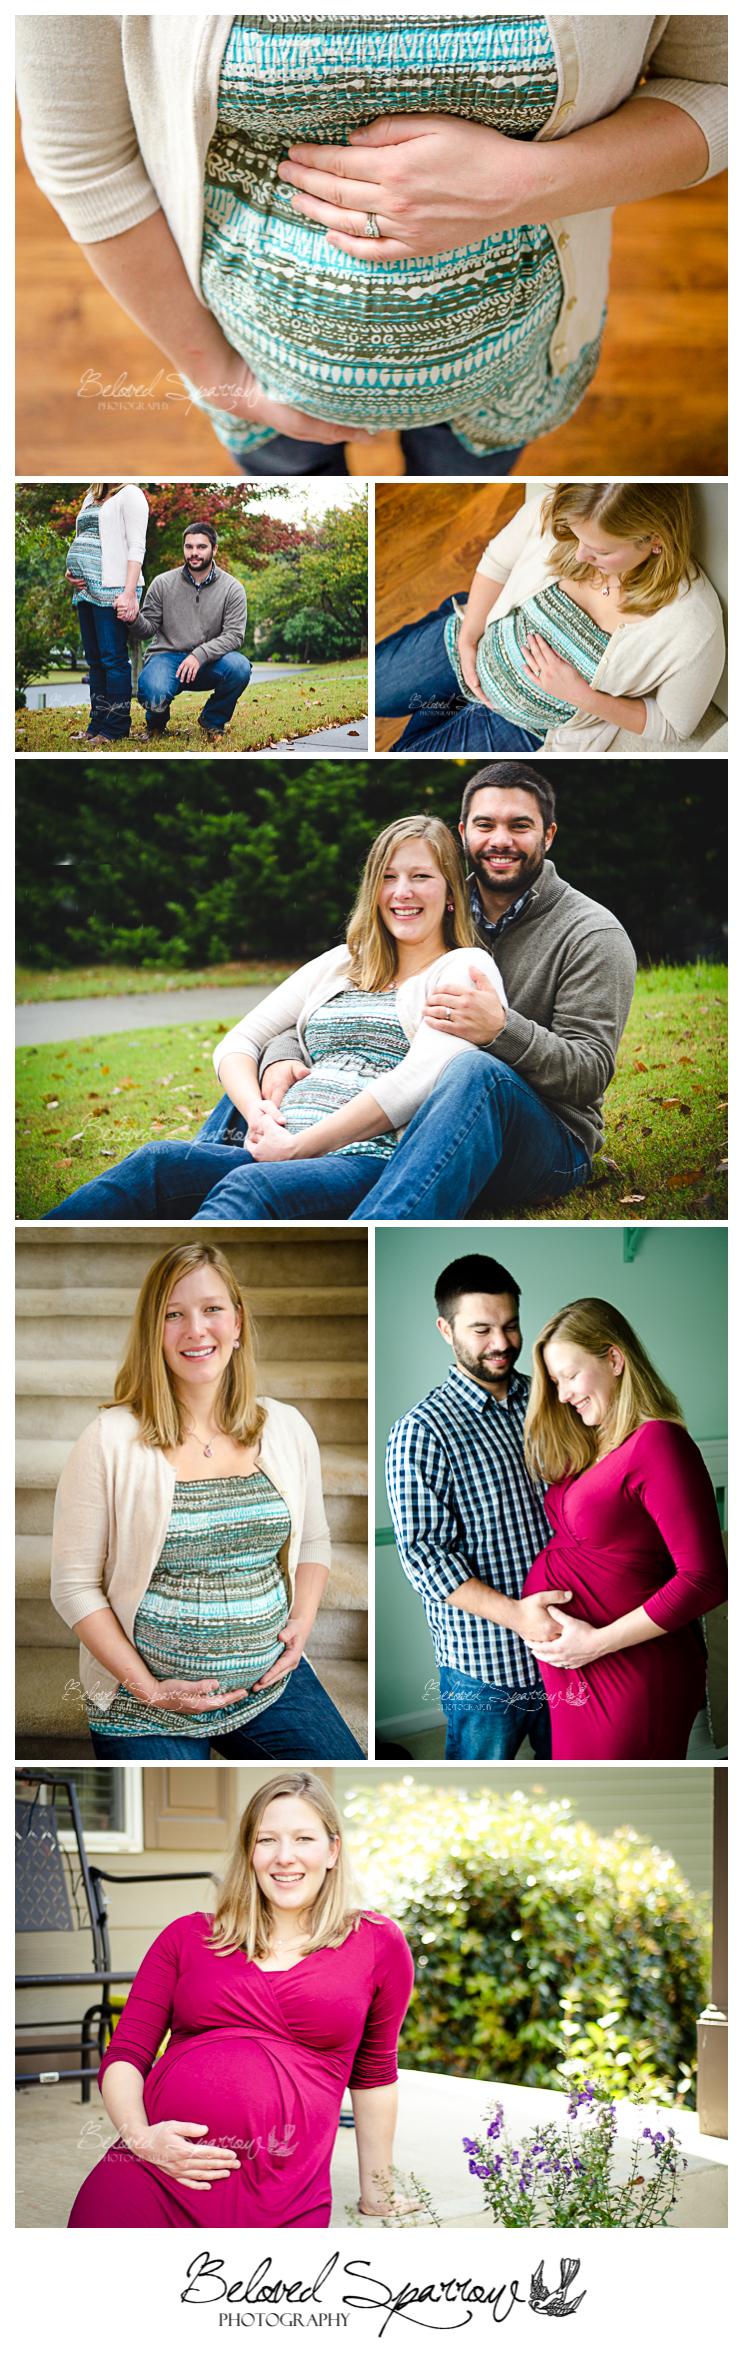 Peachtree City Maternity Professional Photographer